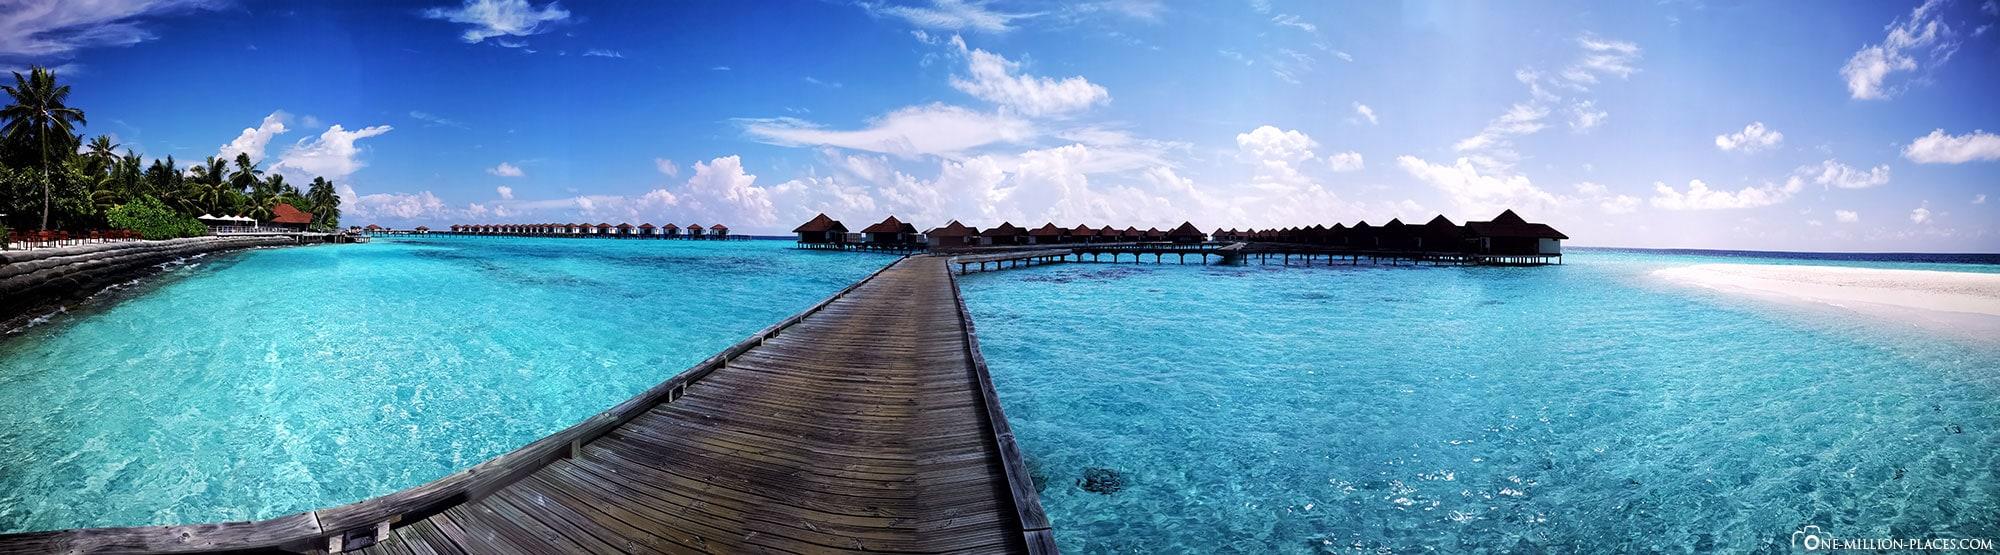 Panoramic jetty, water bungalow, Overwater bungalow, BUM2, ROBINSON Club Maldives, Maldives, Gaaf-Alif-Atoll, travelogue